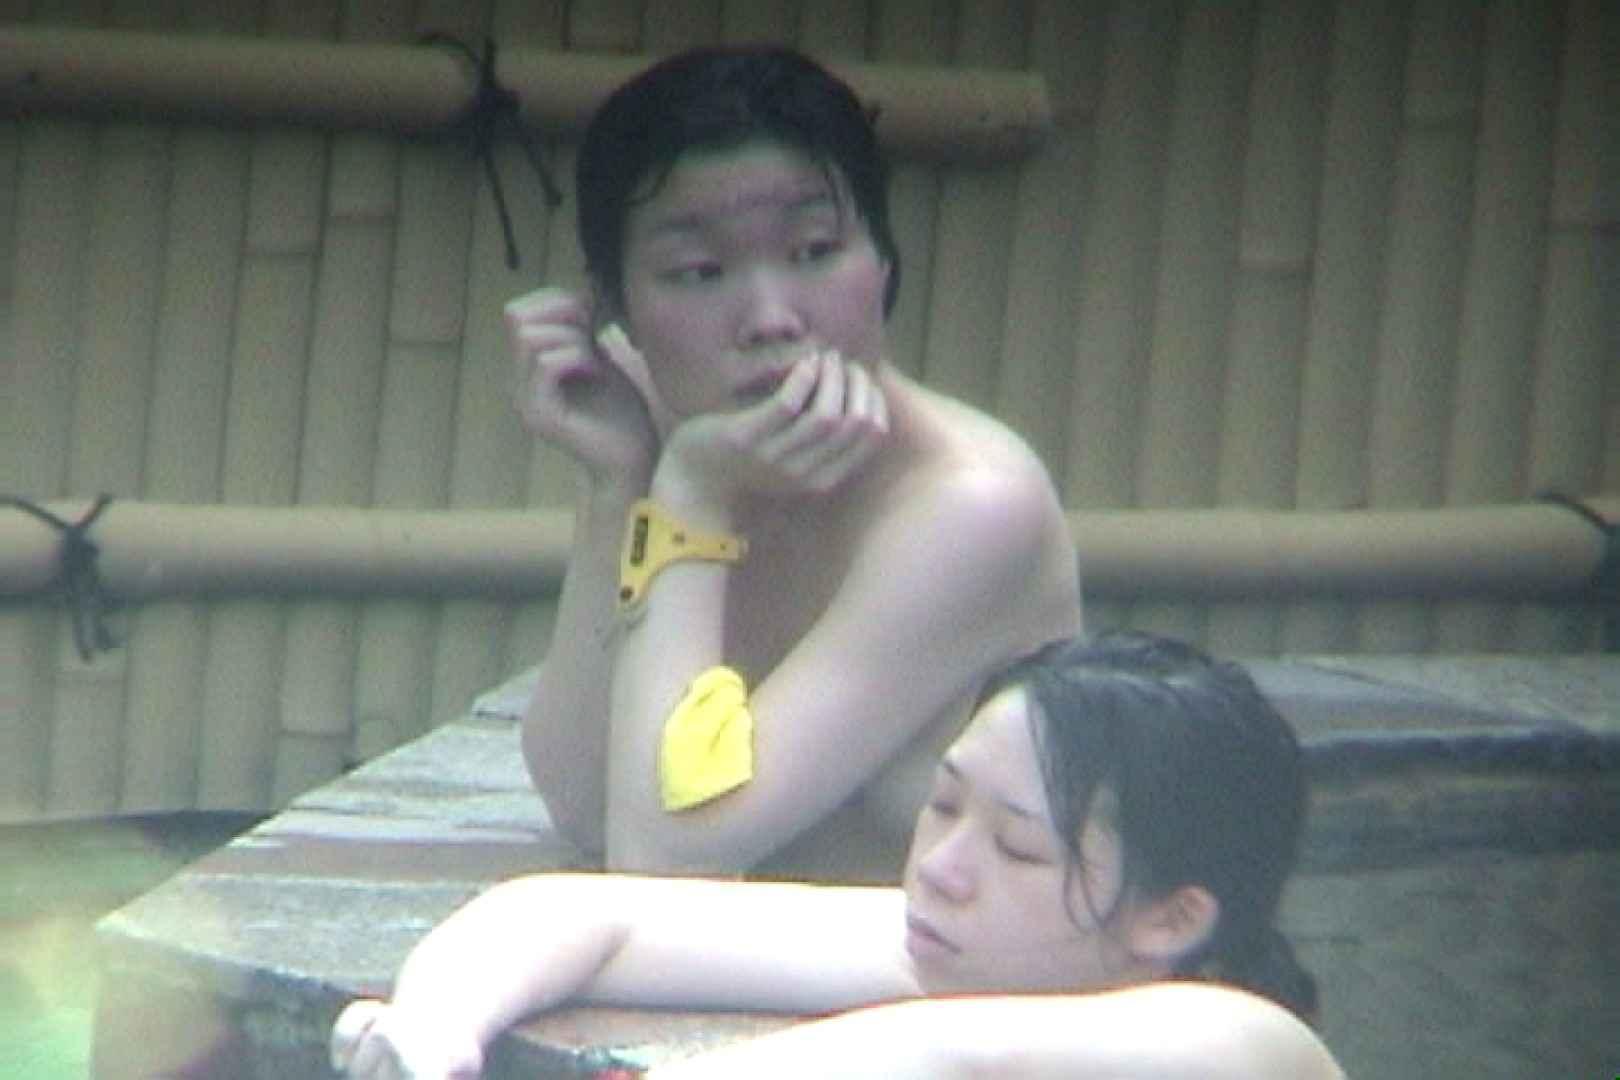 Aquaな露天風呂Vol.105 露天風呂突入 おめこ無修正動画無料 69pic 68